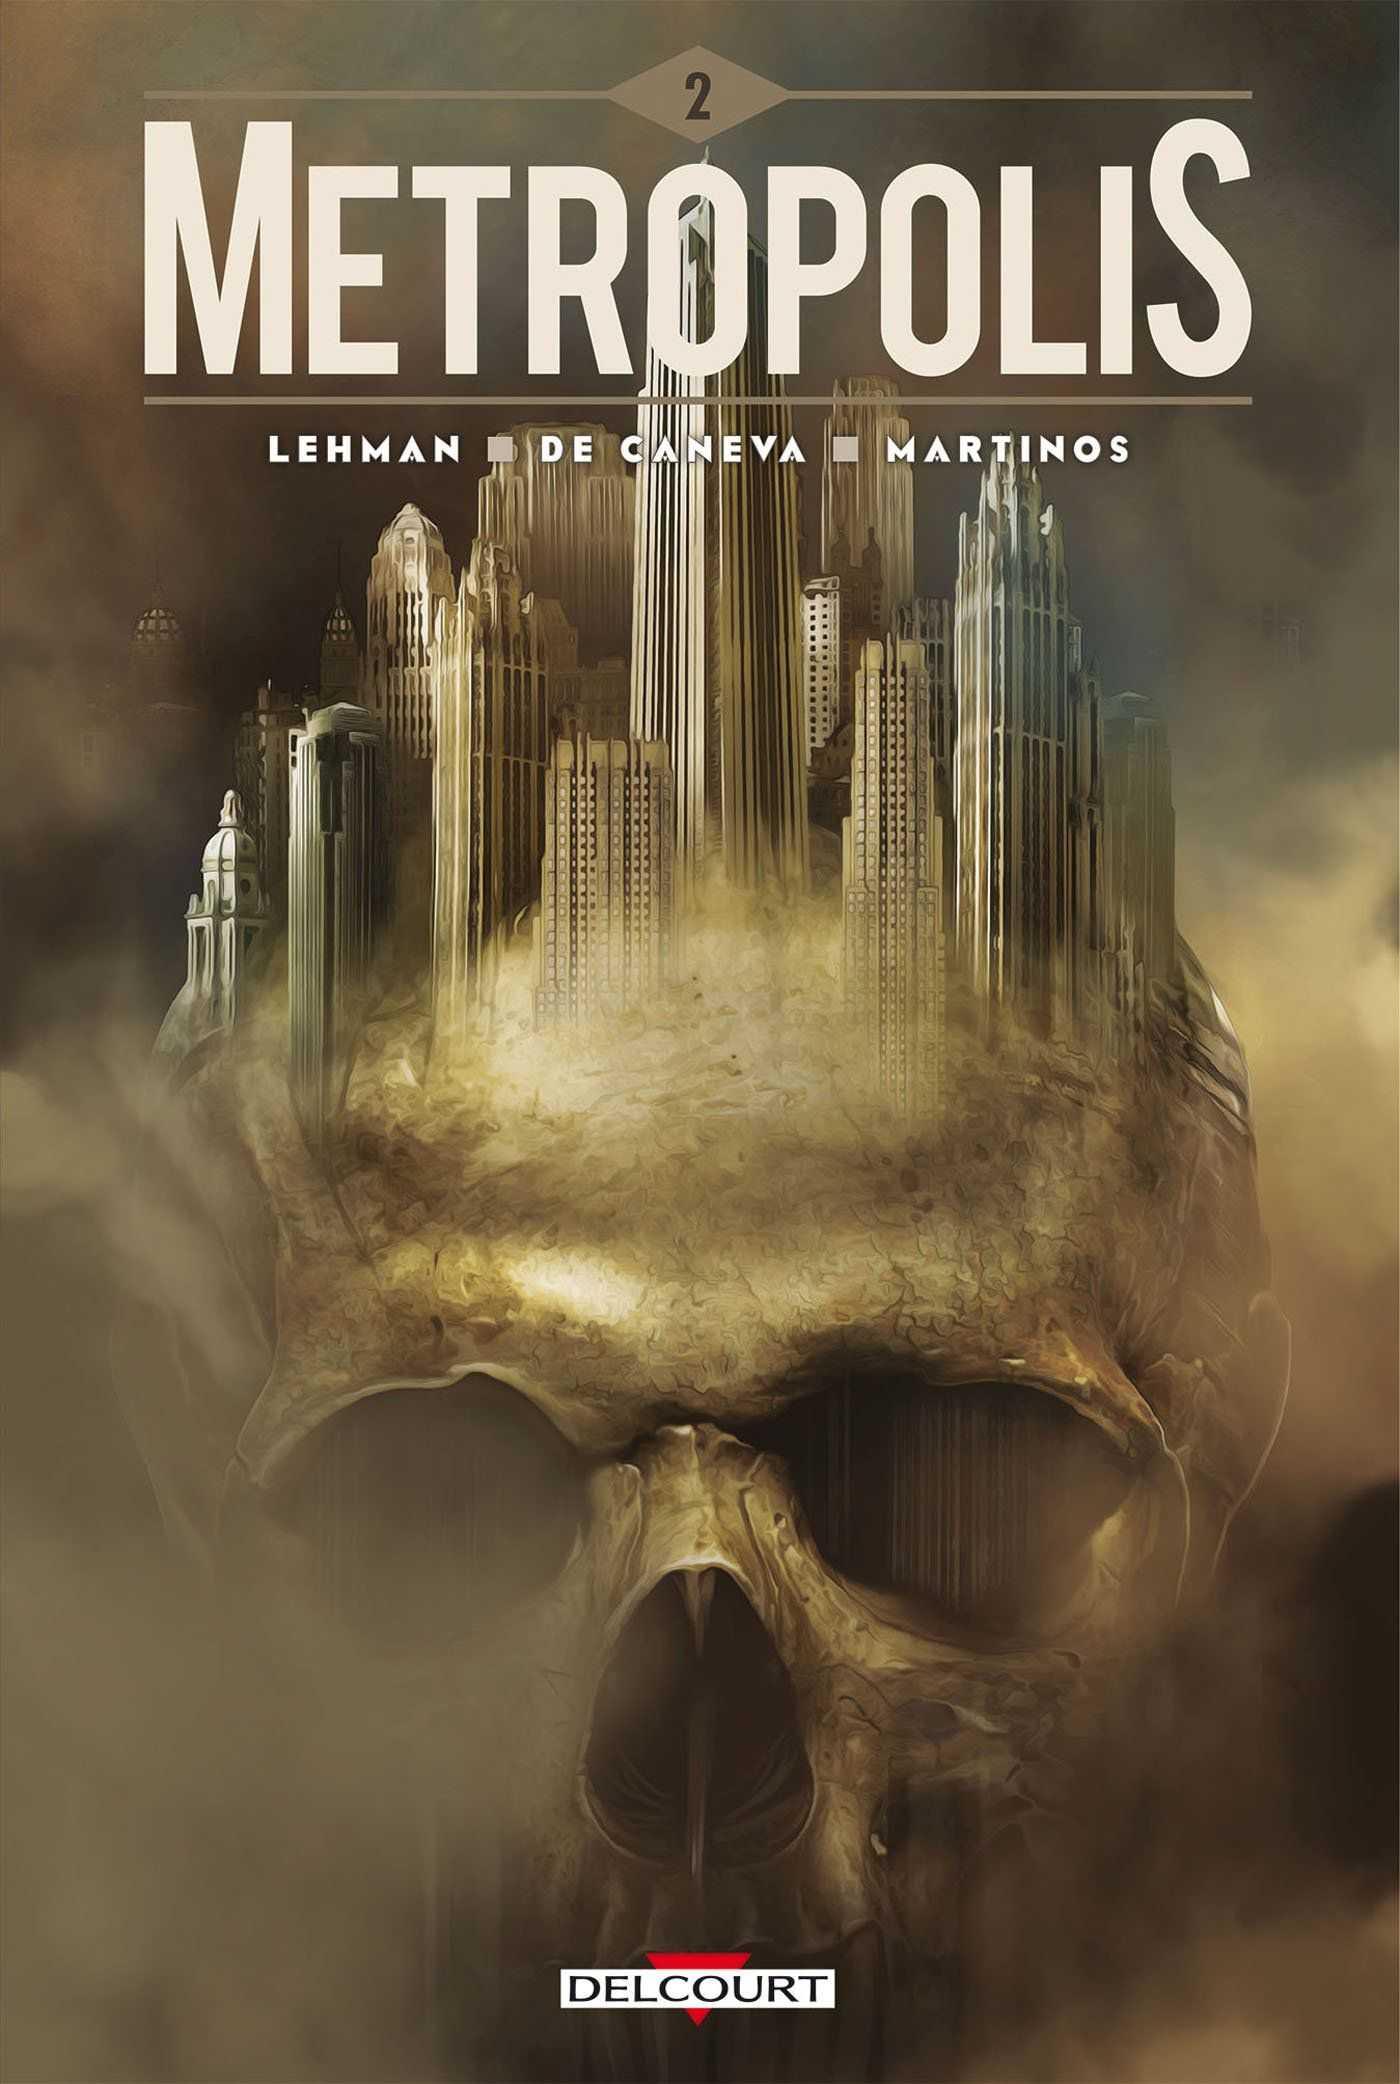 Metropolis, le tome 2 d'une saga novatrice